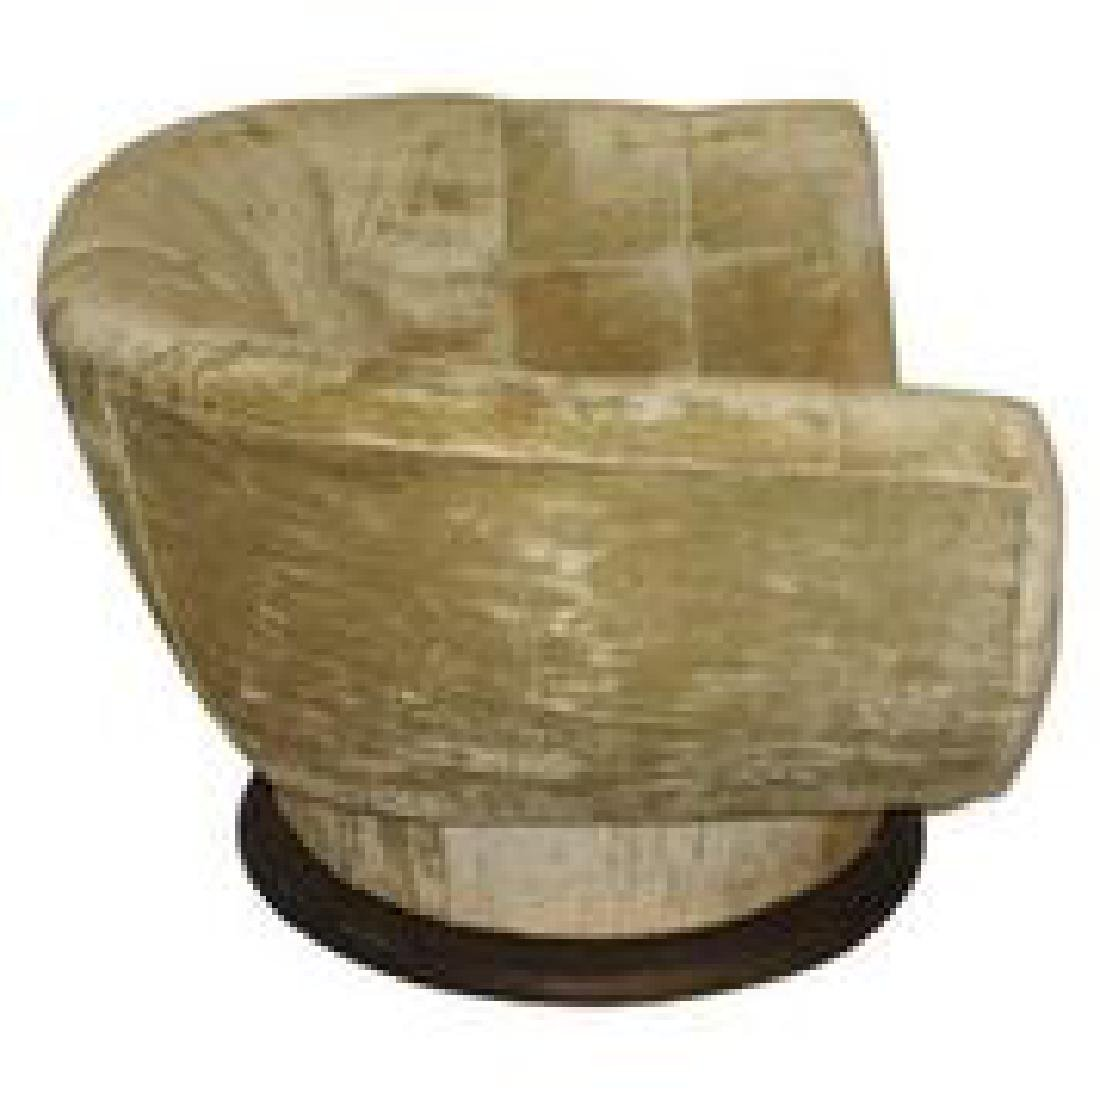 In The Manner of Vladimir Kagan Swivel Chair - 2